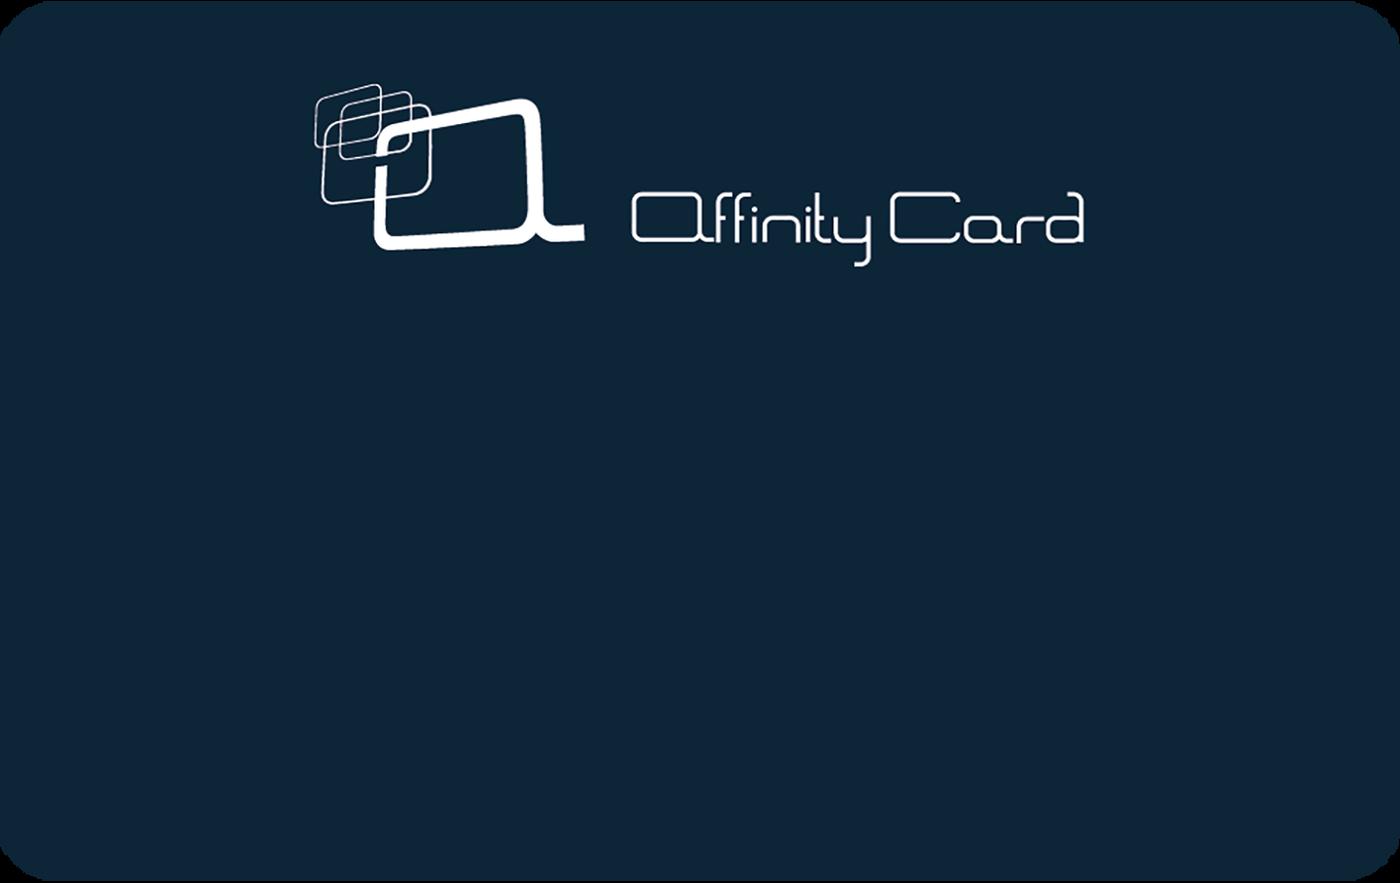 Tarjeta Affinity Card